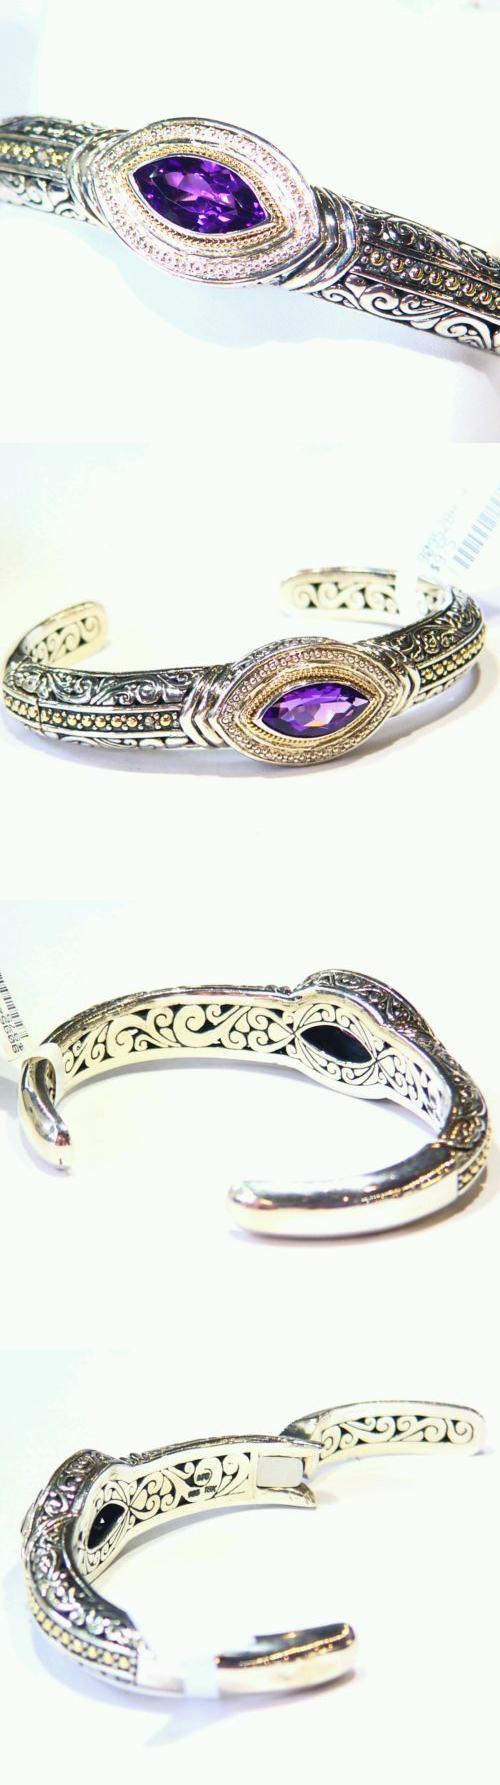 Bracelets samuel b behnam bjc natural stone k gold